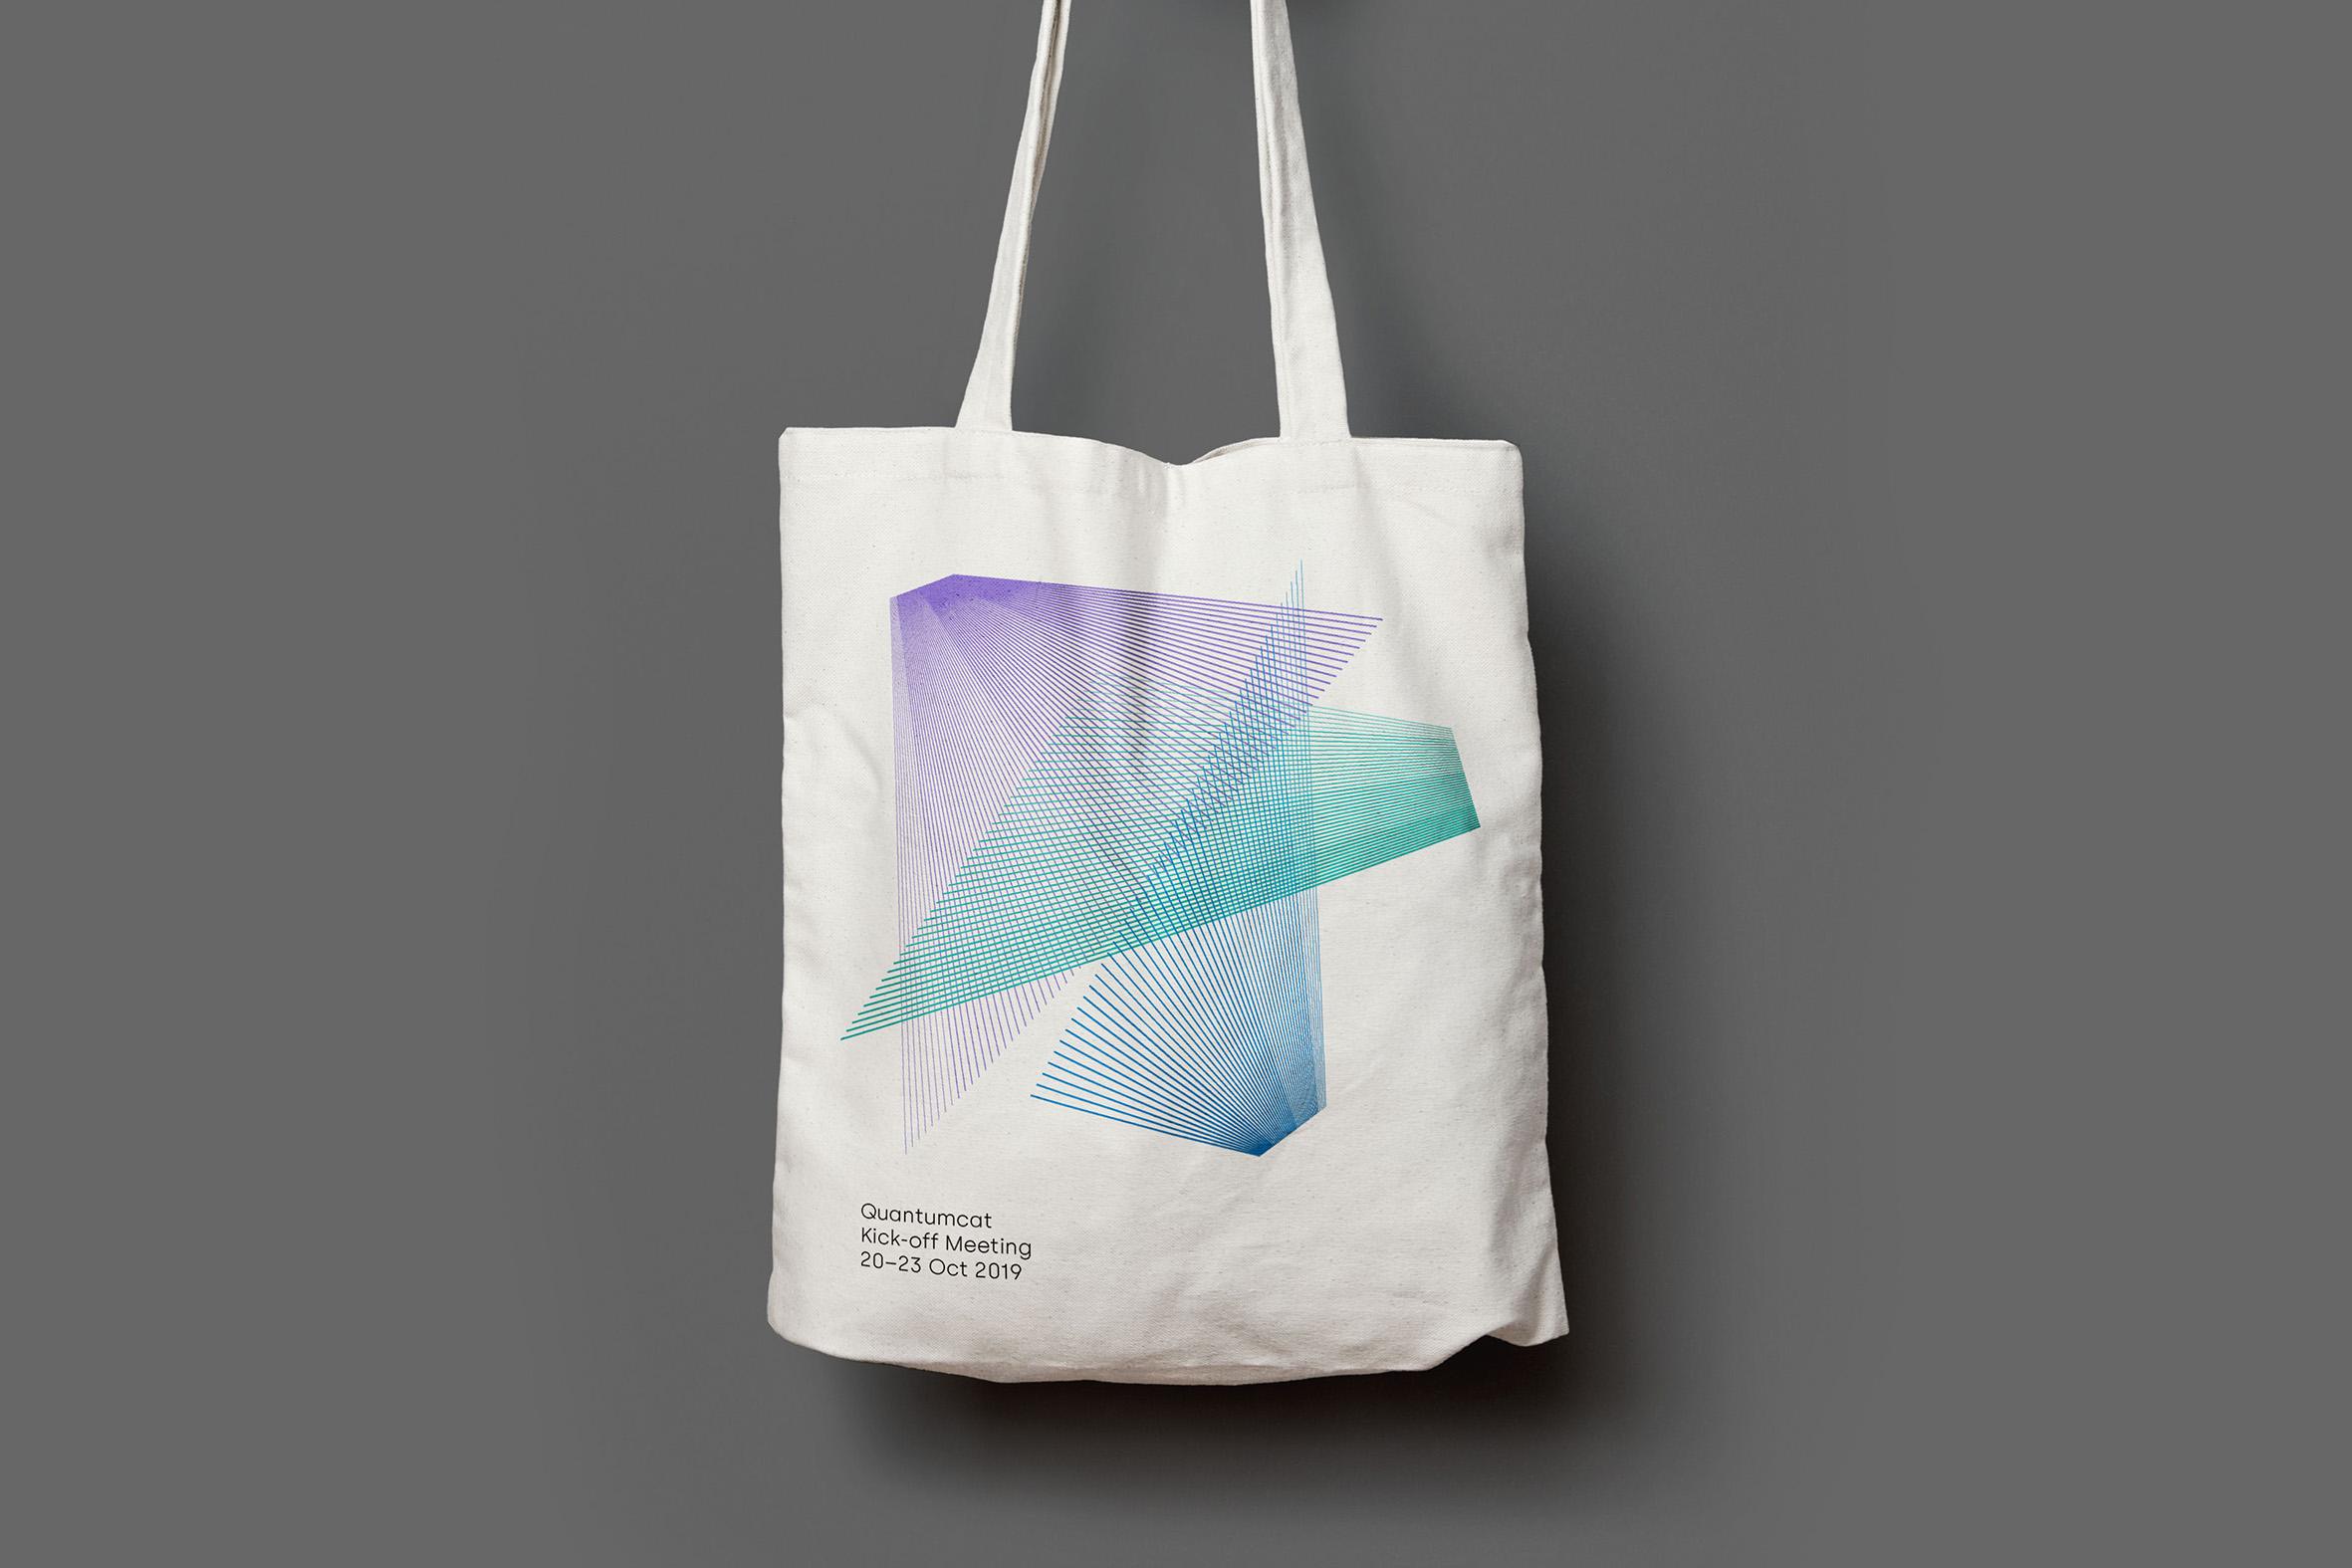 Bitflow-studio-quantumcat-identity-design-logo-research-network-8